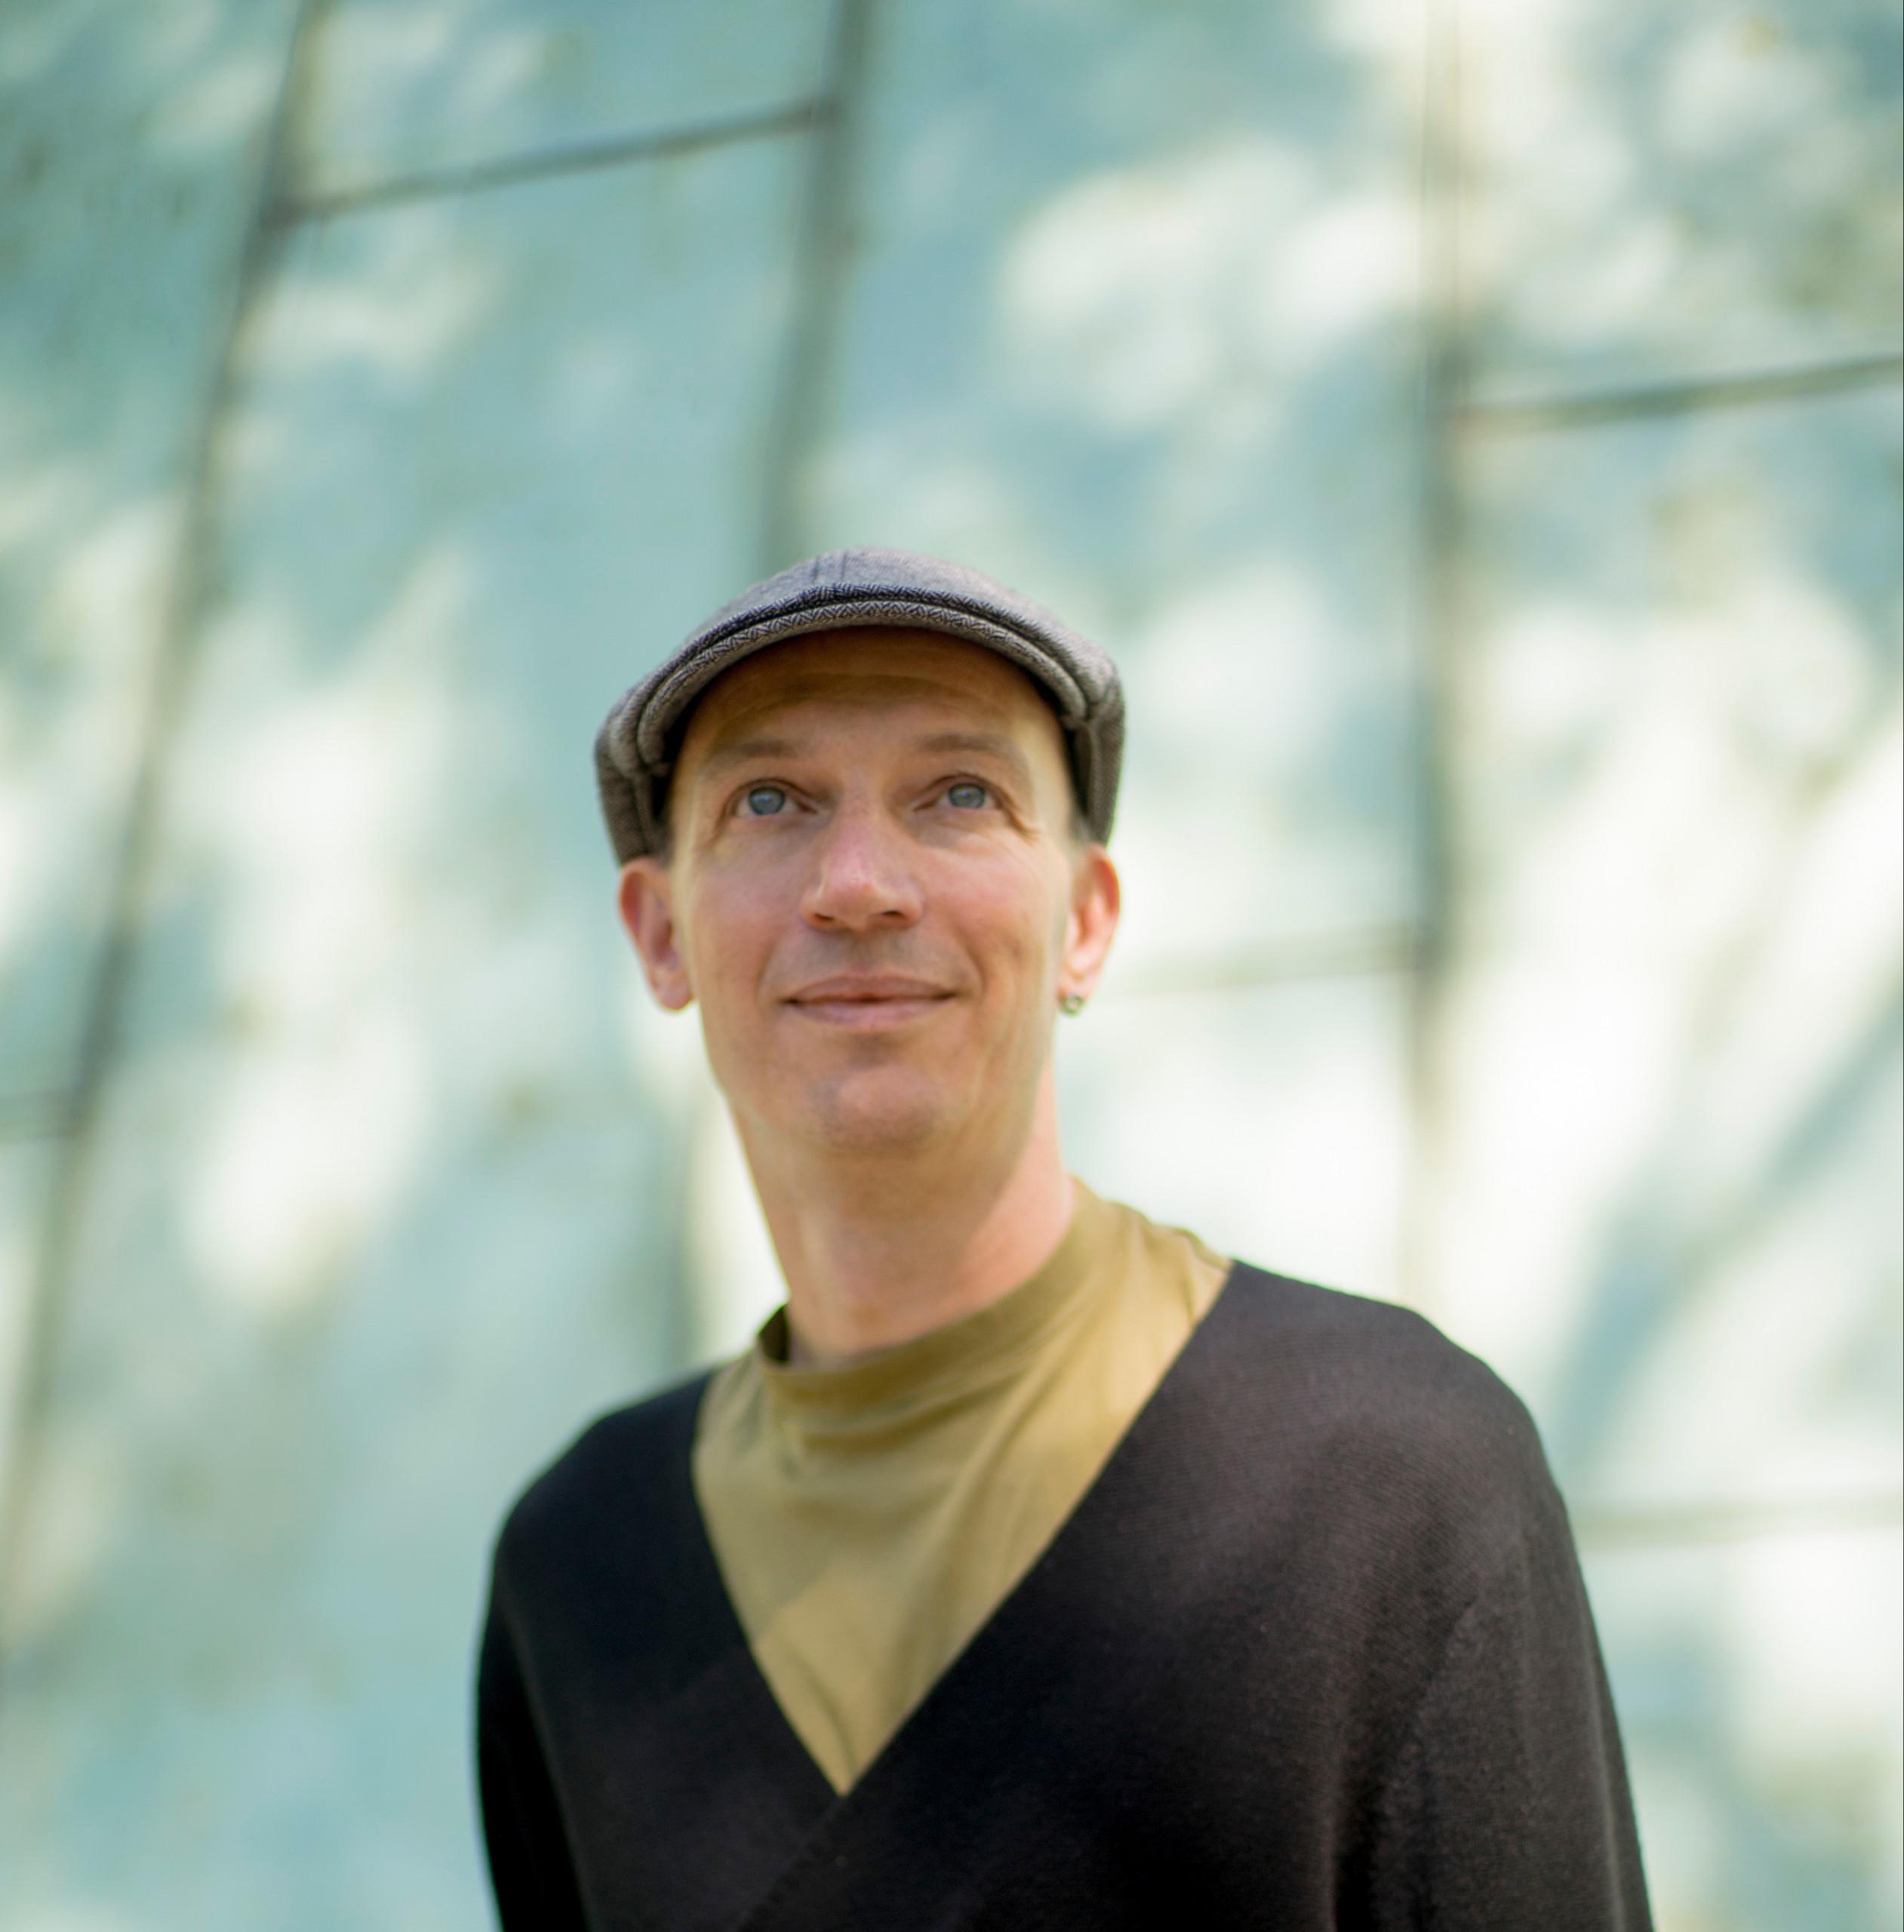 dr-gregor-ohlerich-freier-lektor-lektorat-berlin-2019